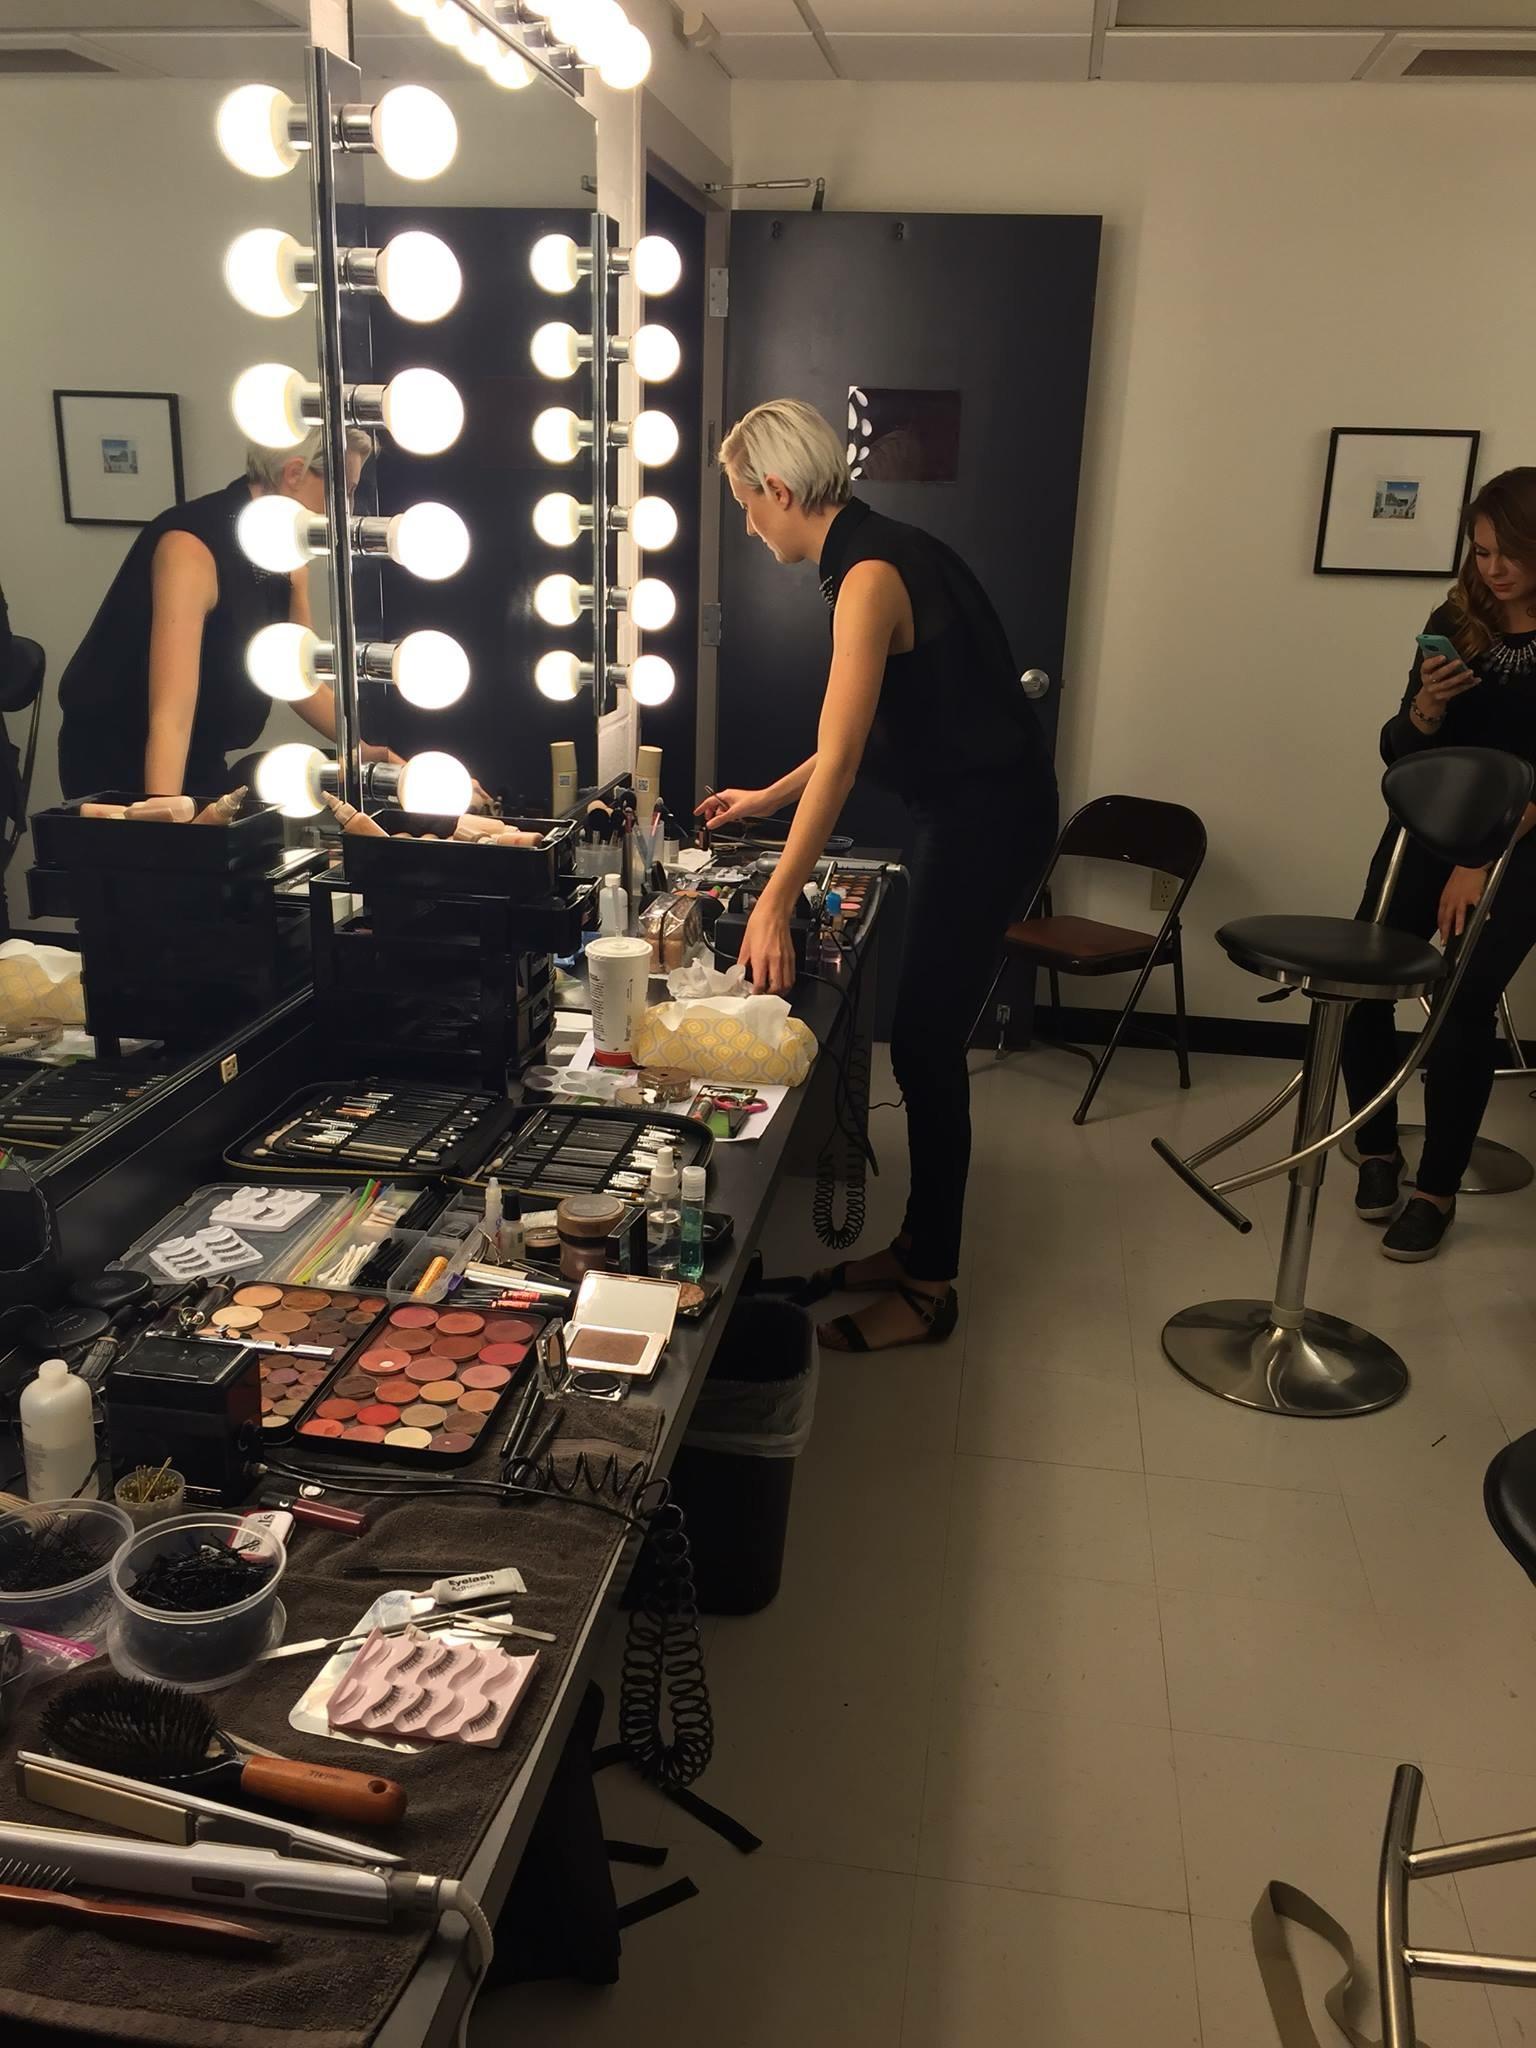 Working backstage